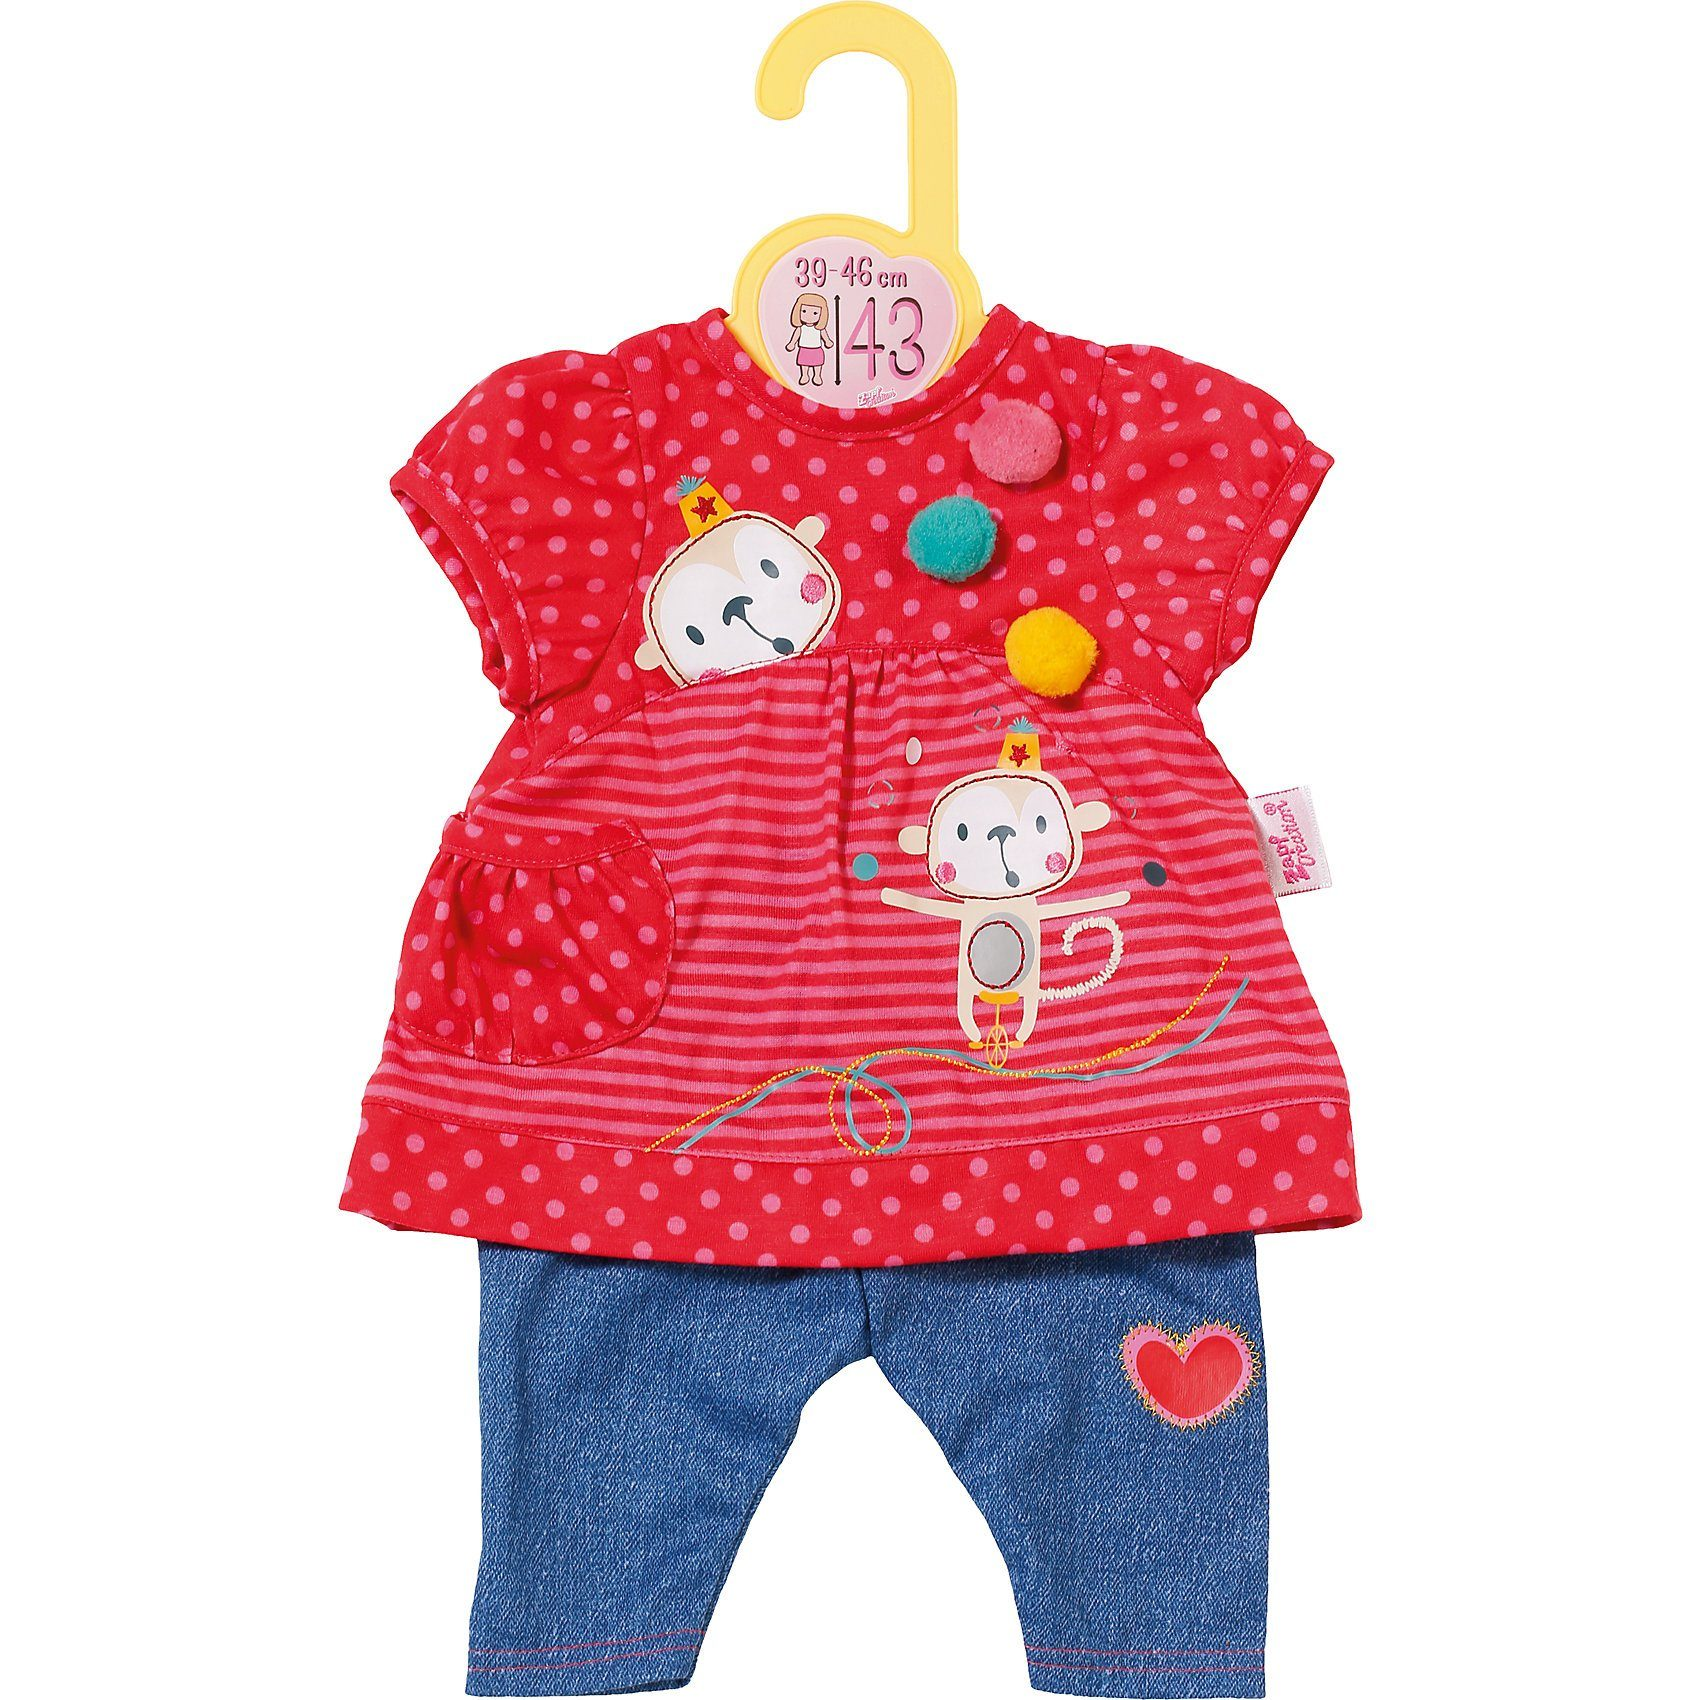 Kinder Pyjama SET Hose /& Shirt Me to you Schlafanzug 86 92 98 104 Bär Mint Pink